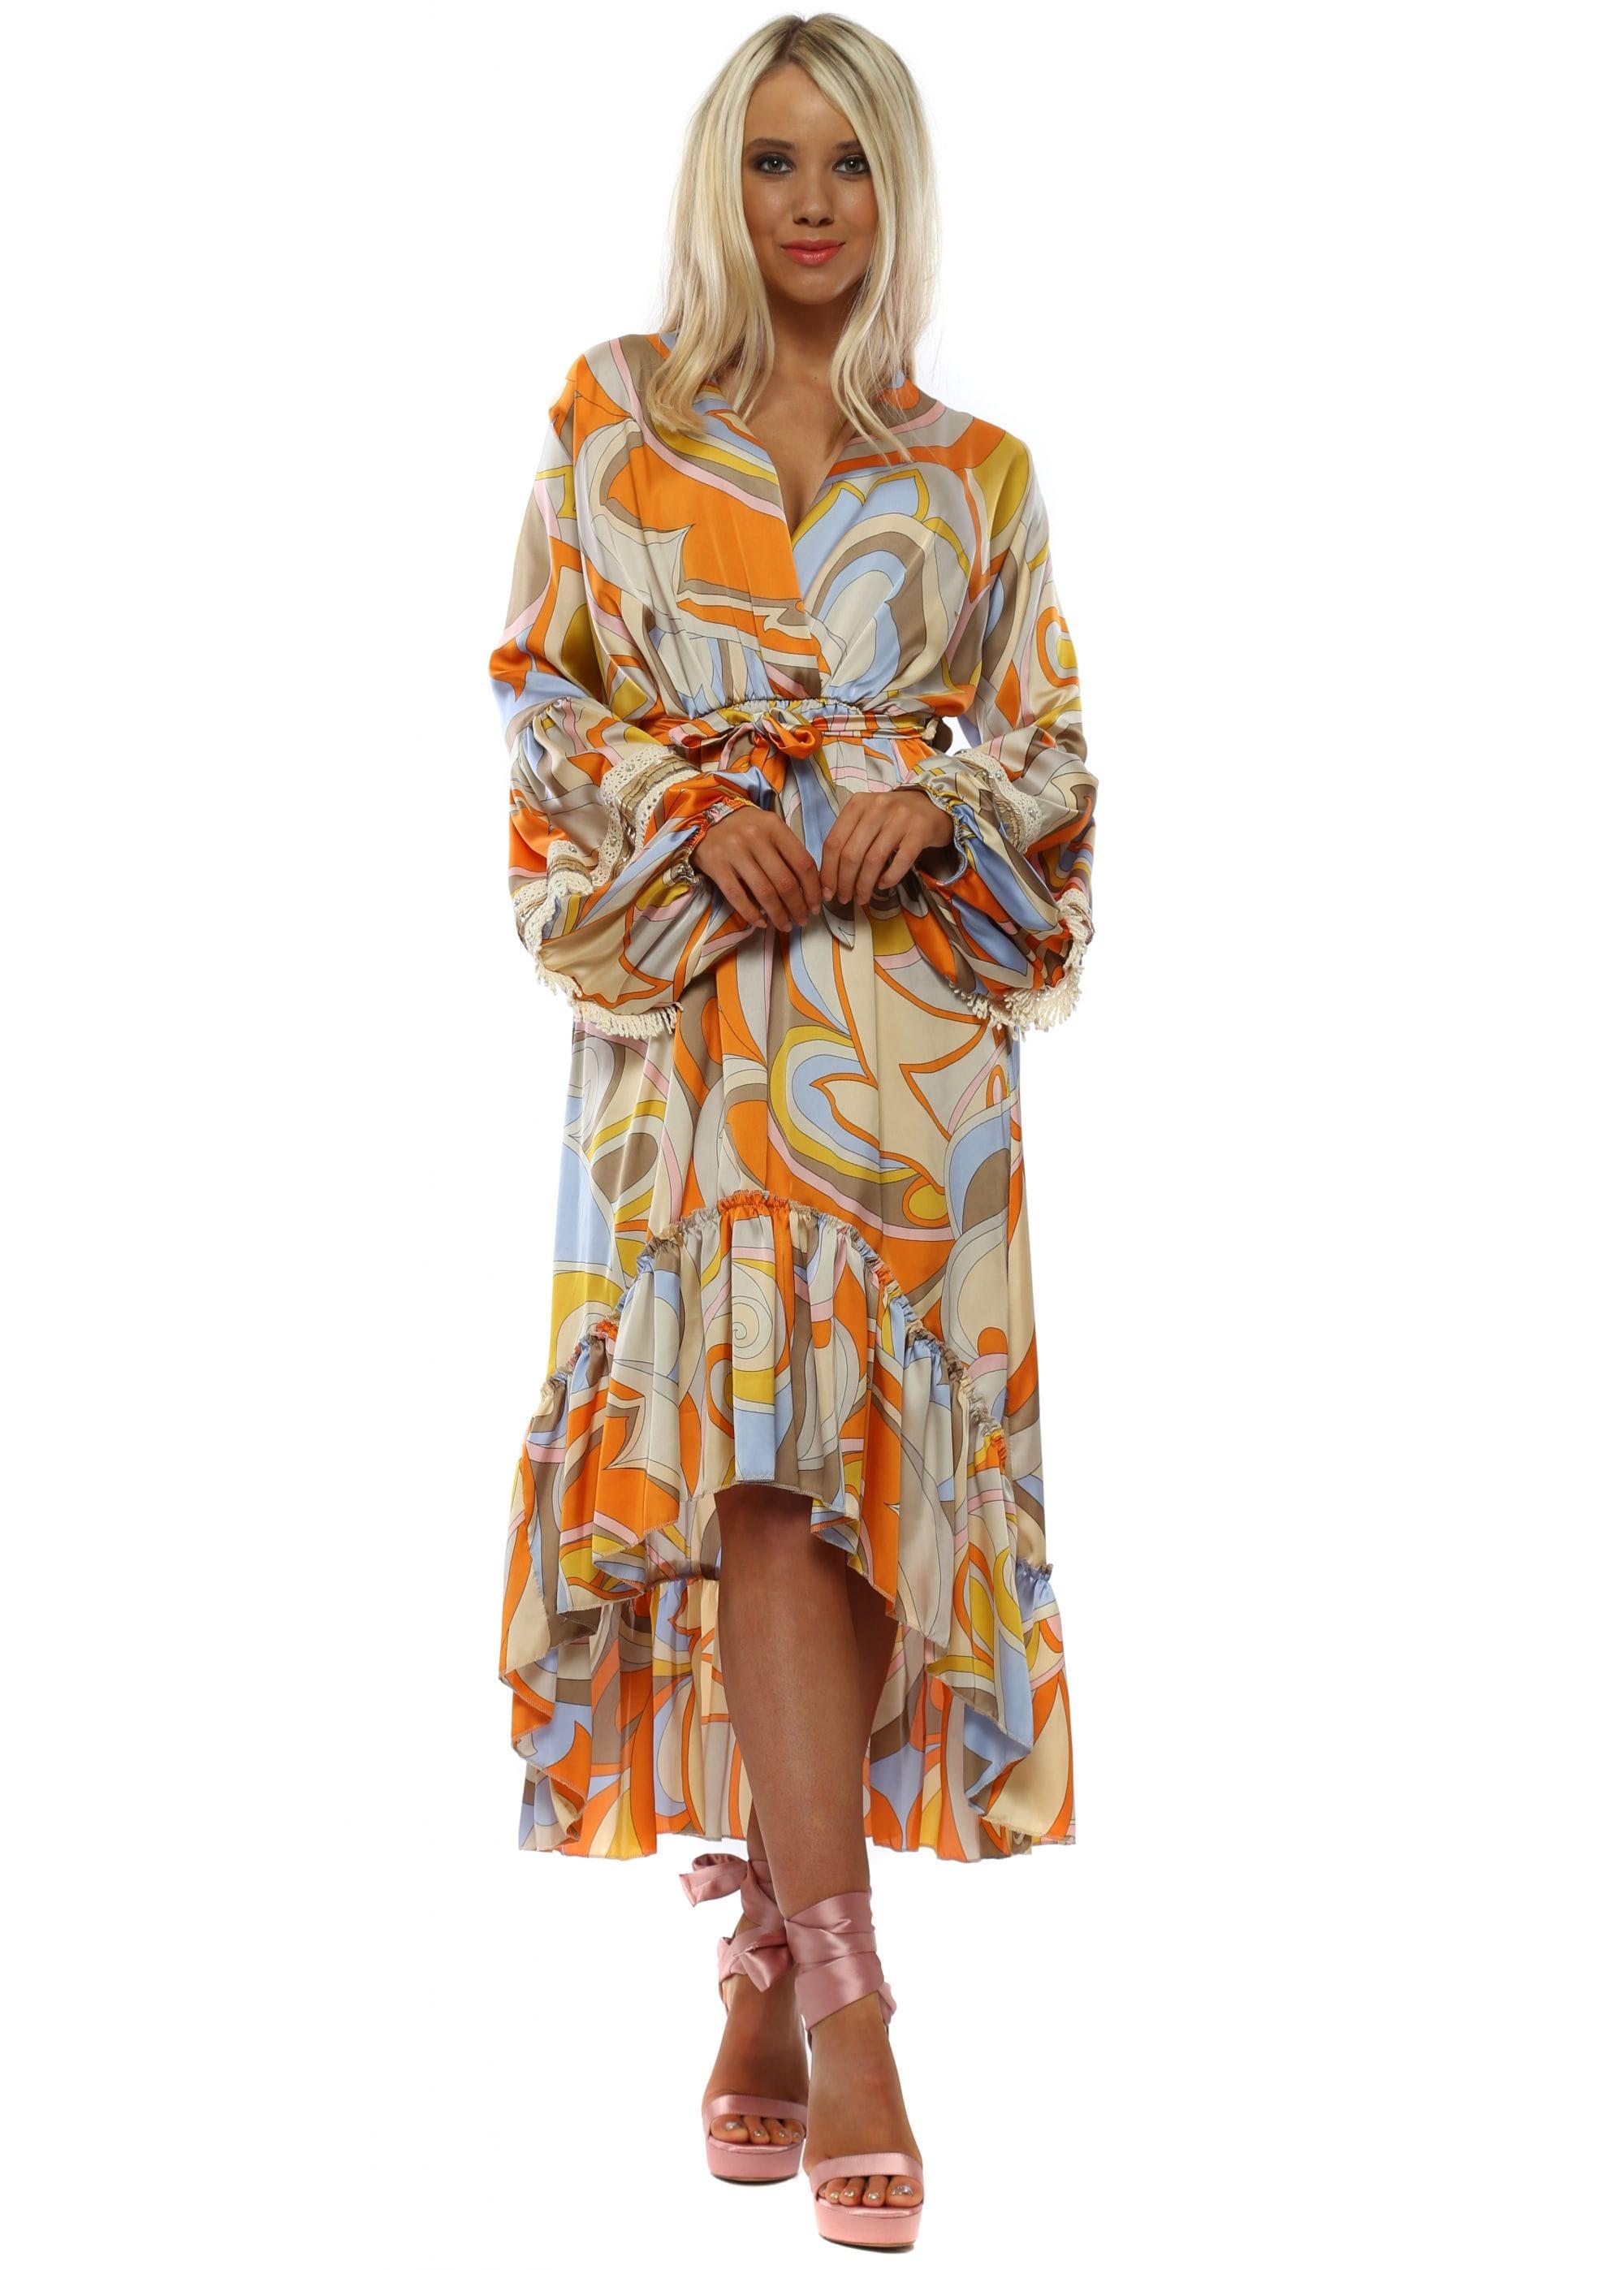 7c8d1dbb20dc5 Orange & Blue Swirl Long Sleeve High Low Dress